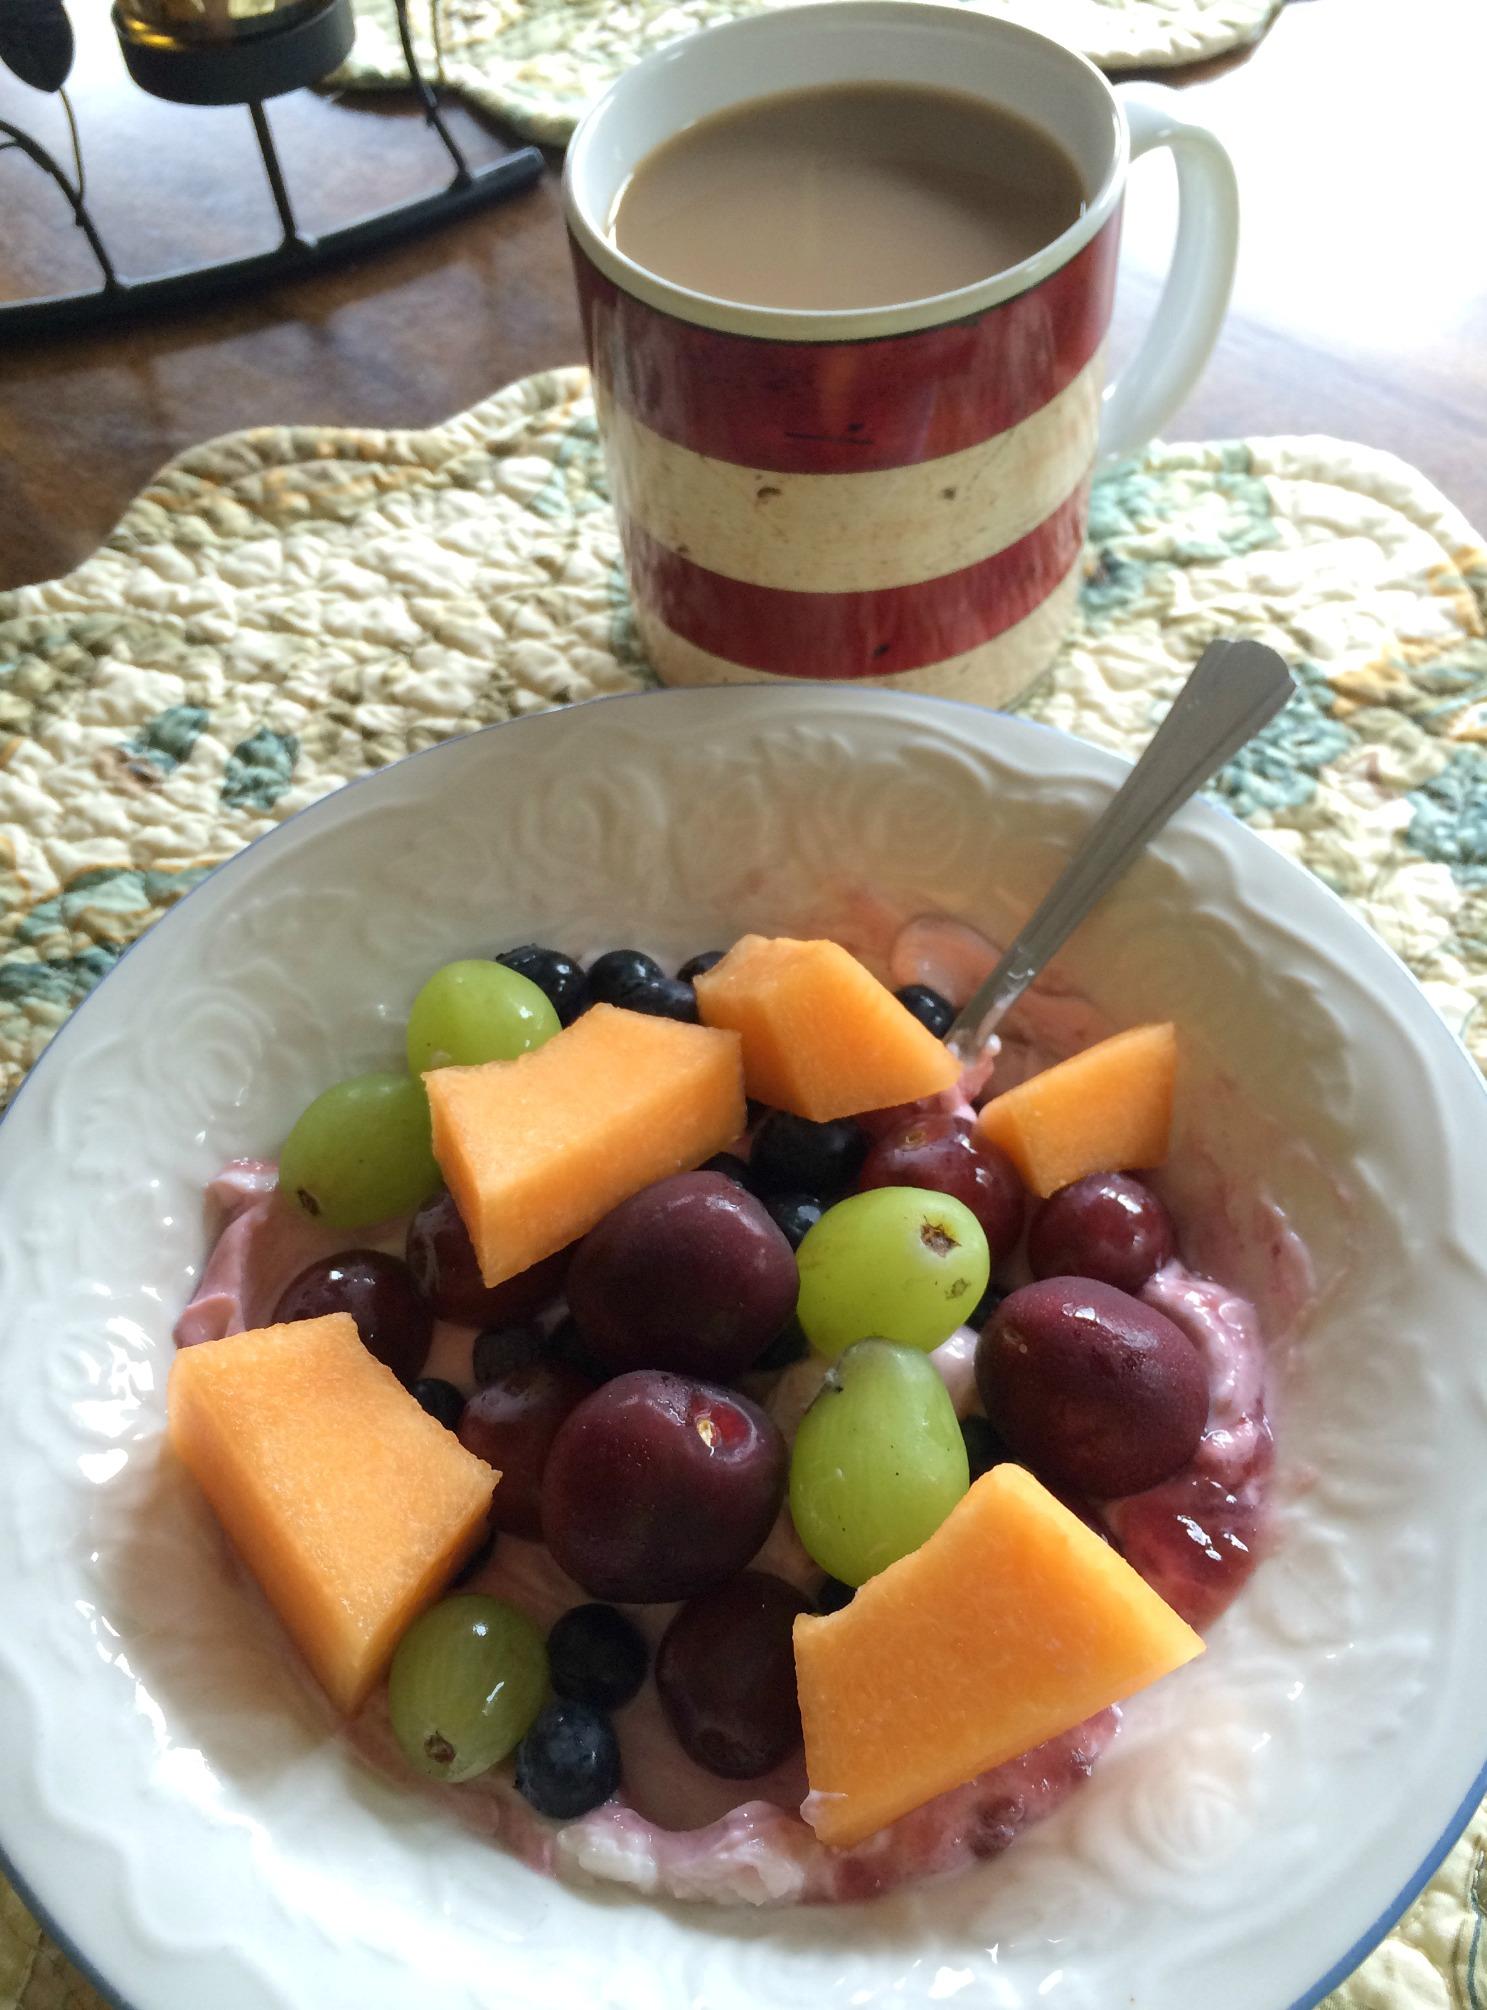 coffee with fruit and yogurt bowl